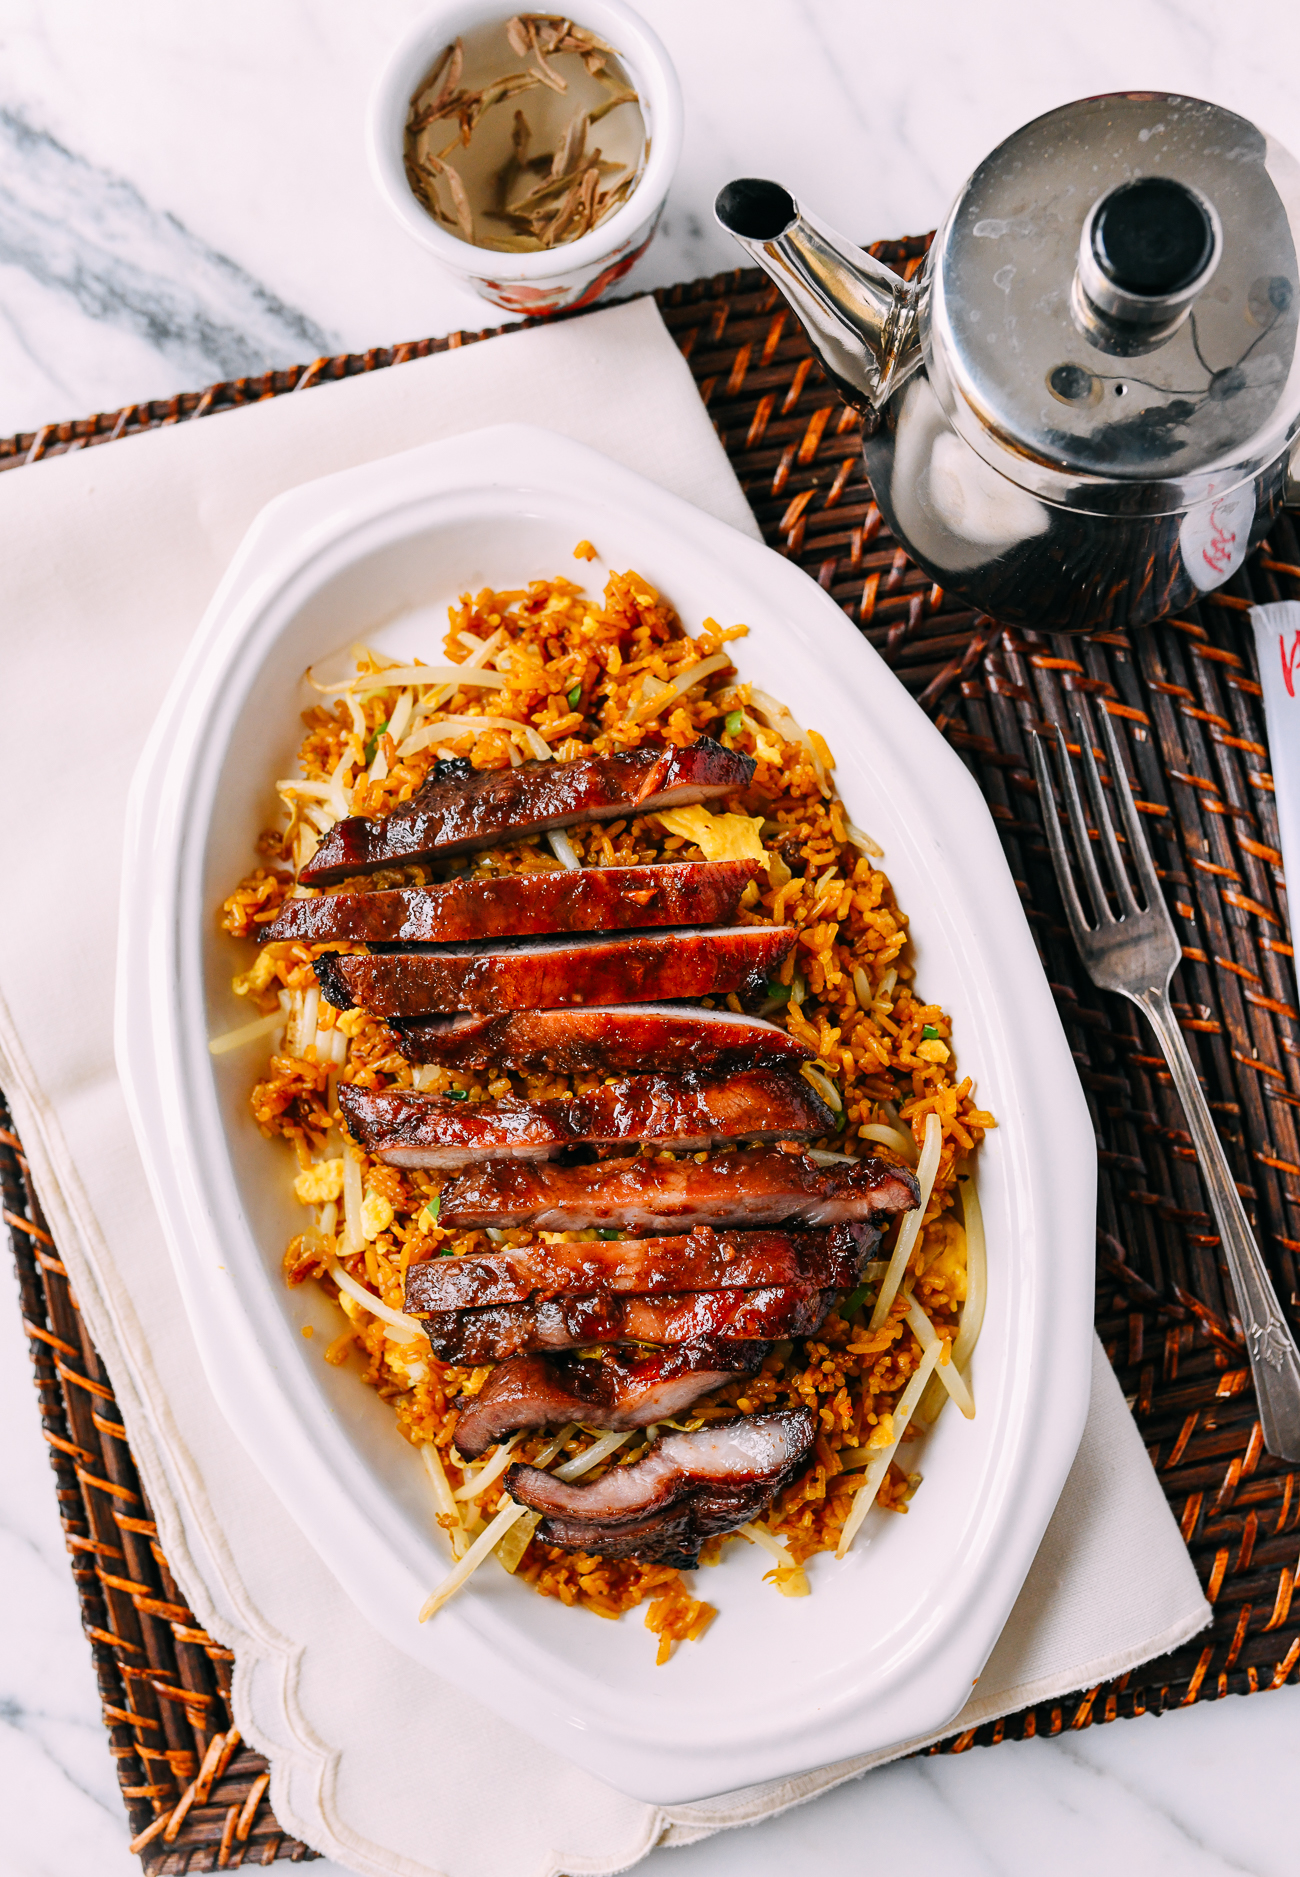 Chinese boneless ribs over fried rice